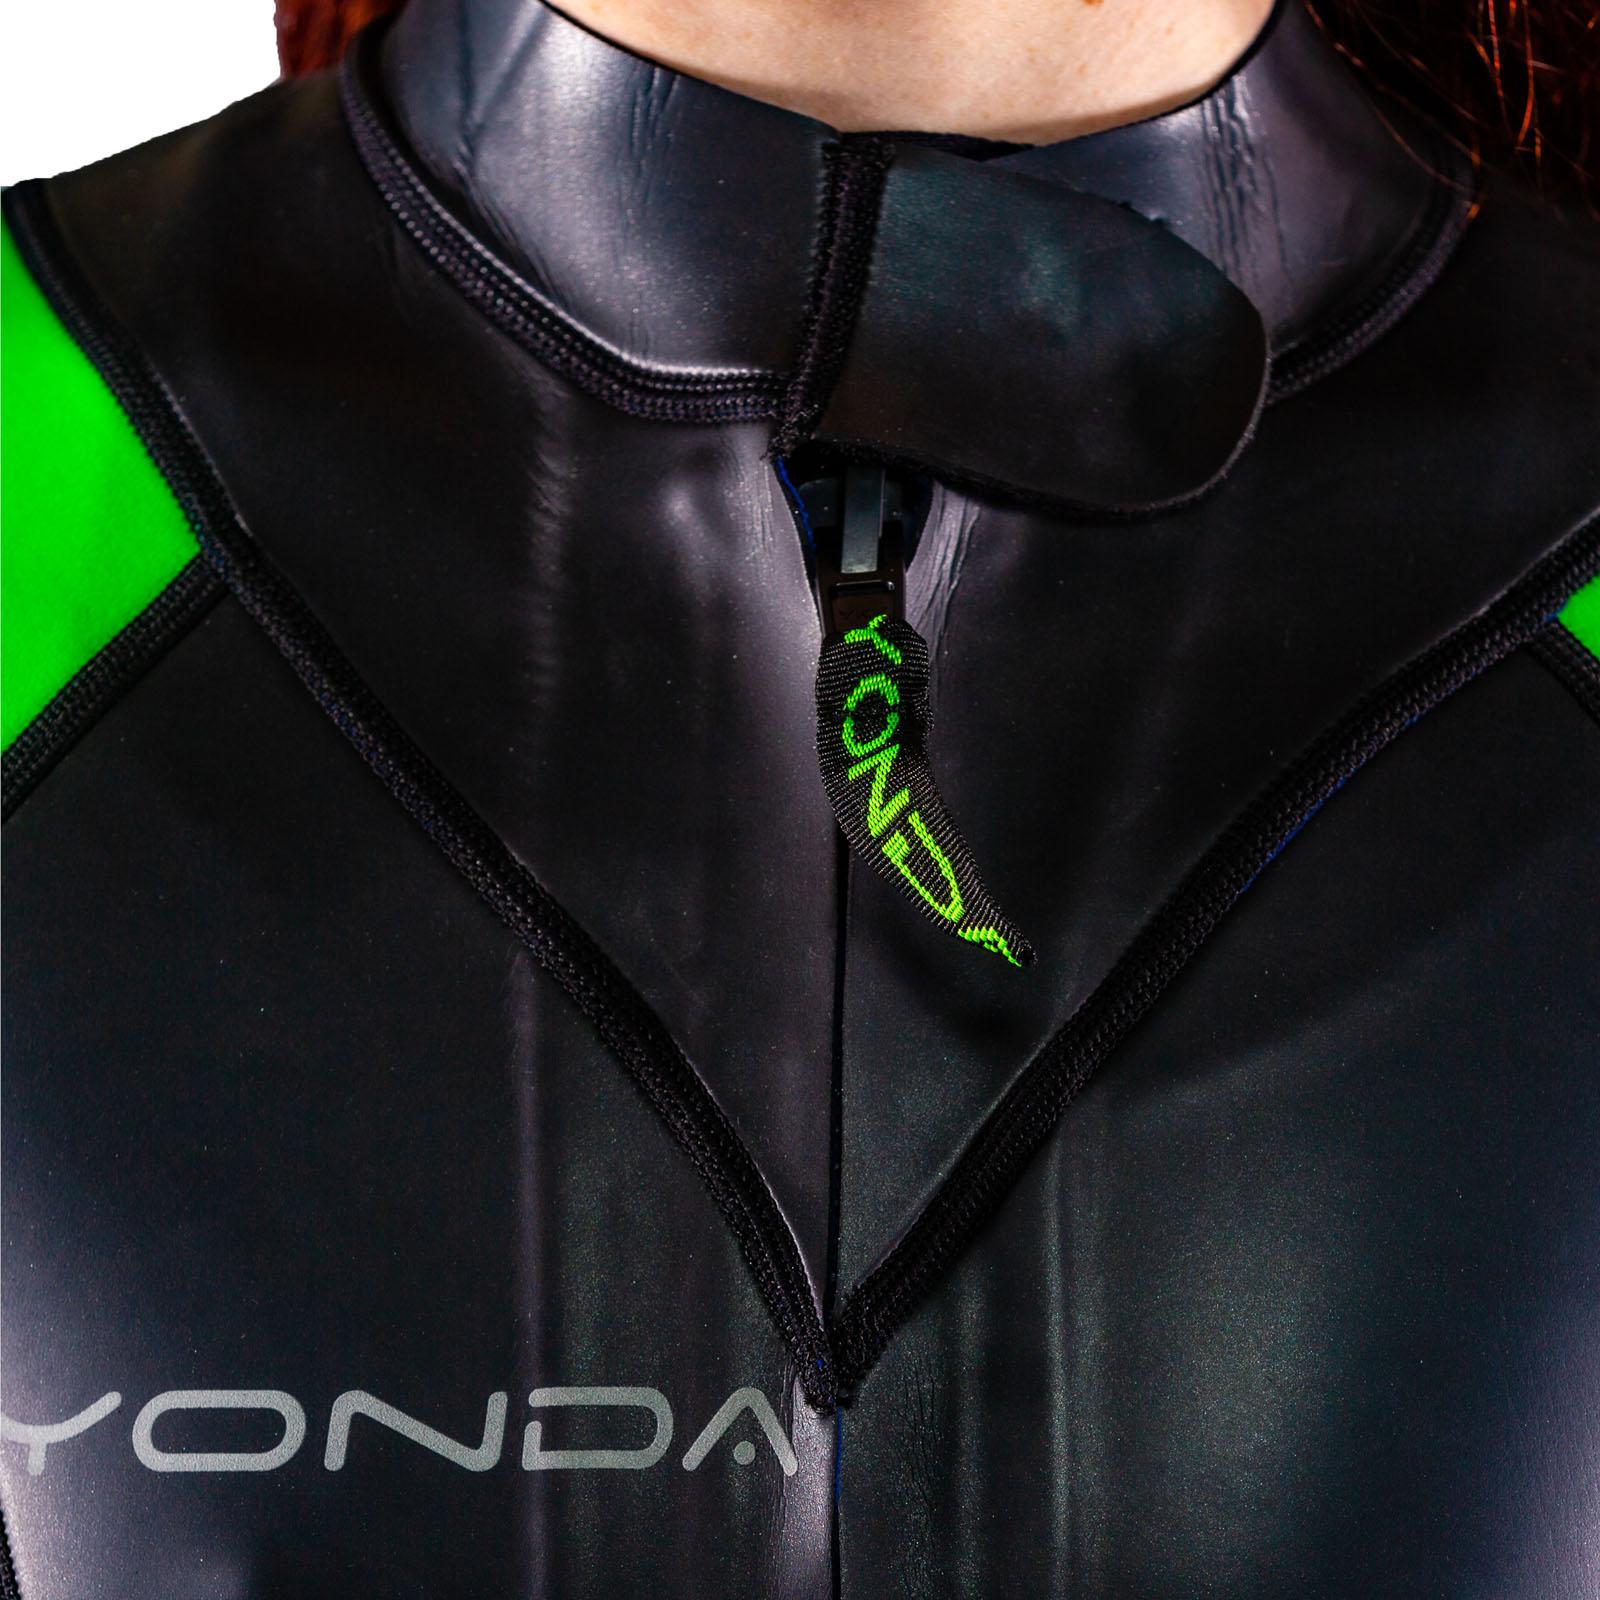 Yonda Spook Swim Run - Women's Wetsuit